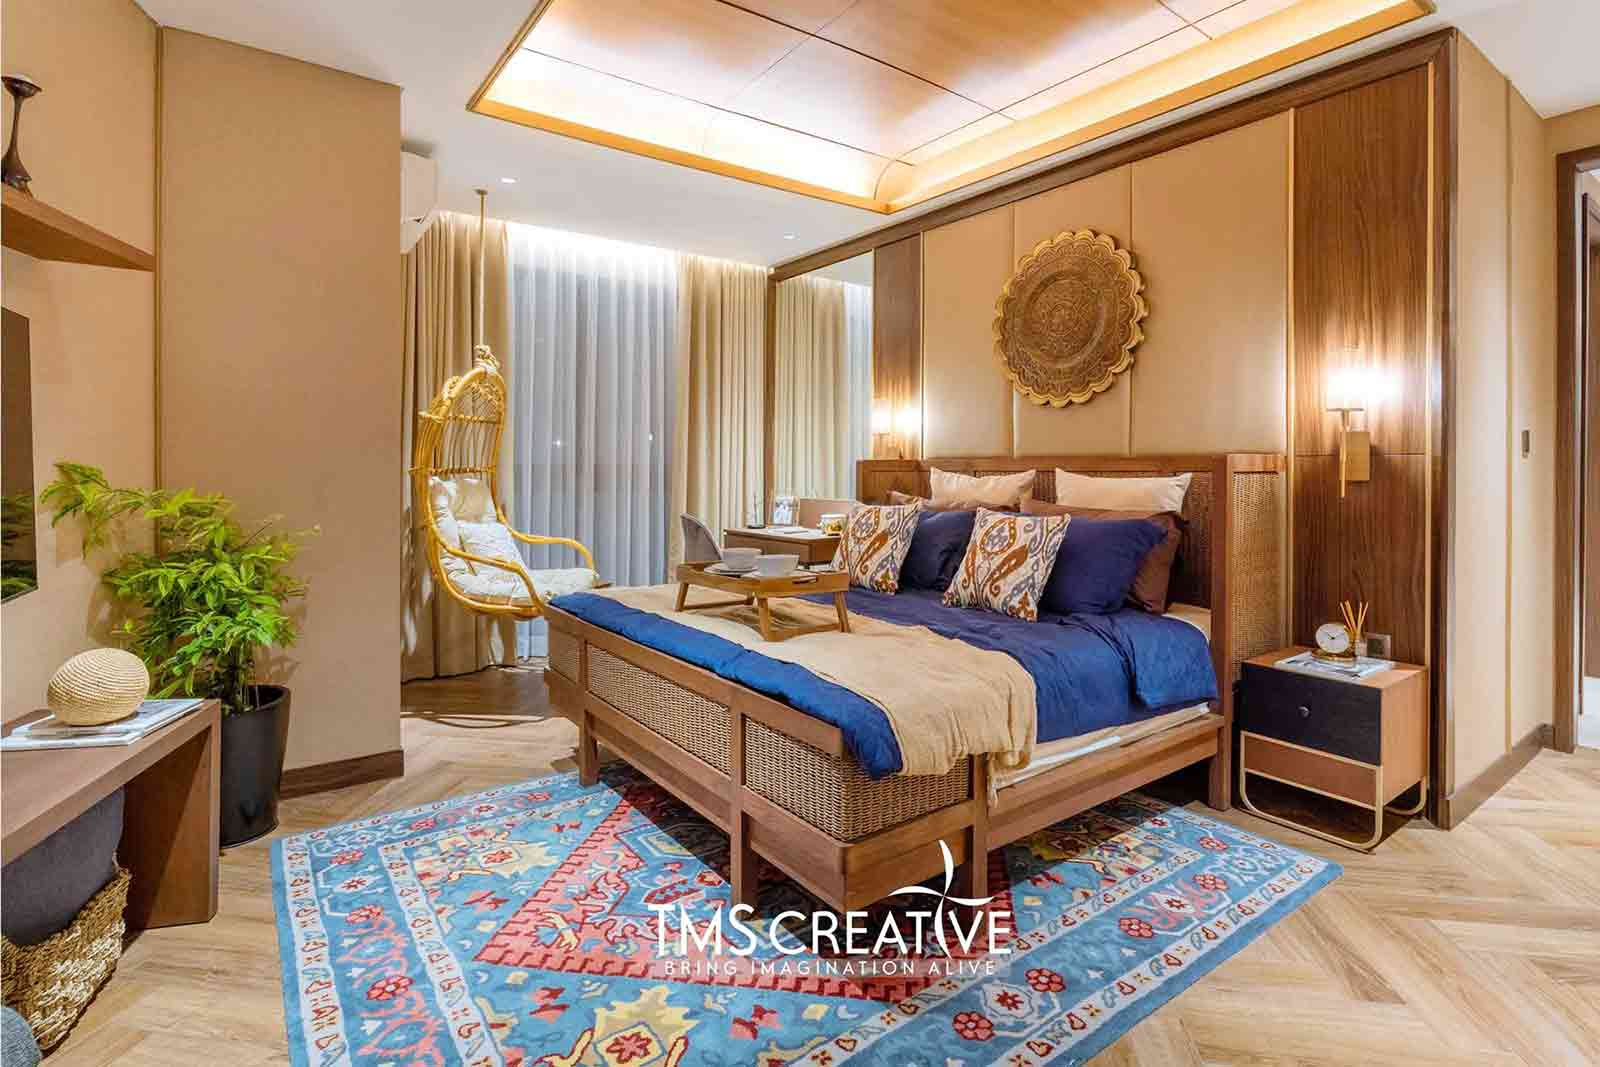 Interior penuh detail karya TMS Creative, via arsitag.com